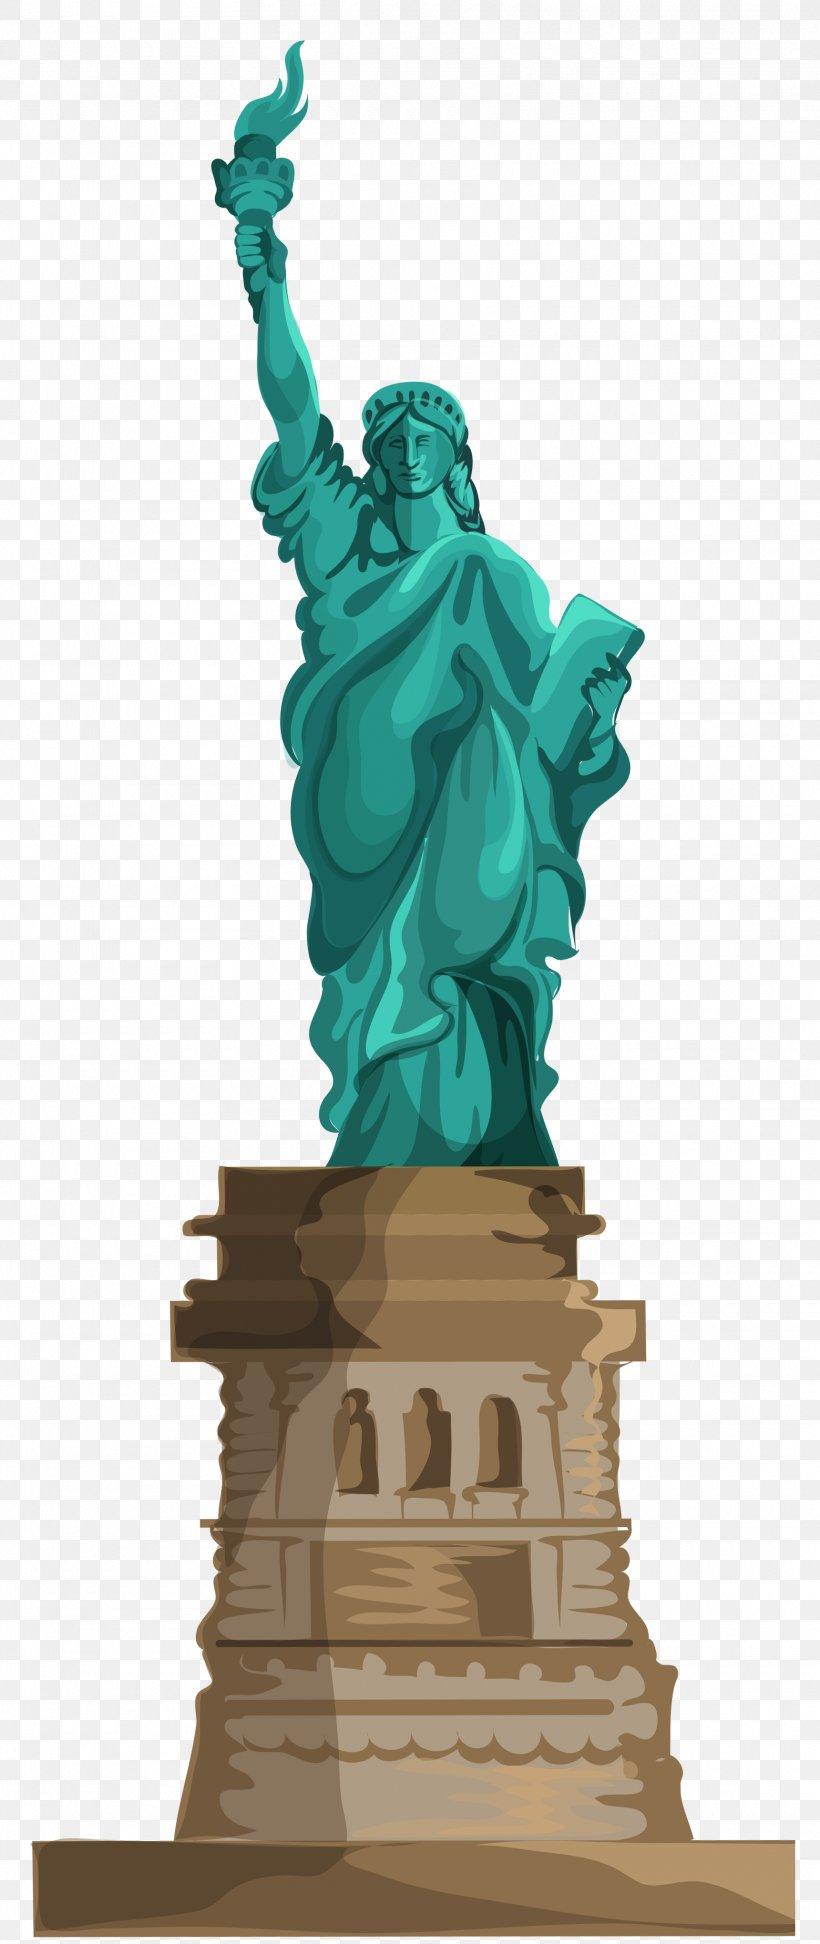 Statue Of Liberty Battery Park Ellis Island New York Harbor.